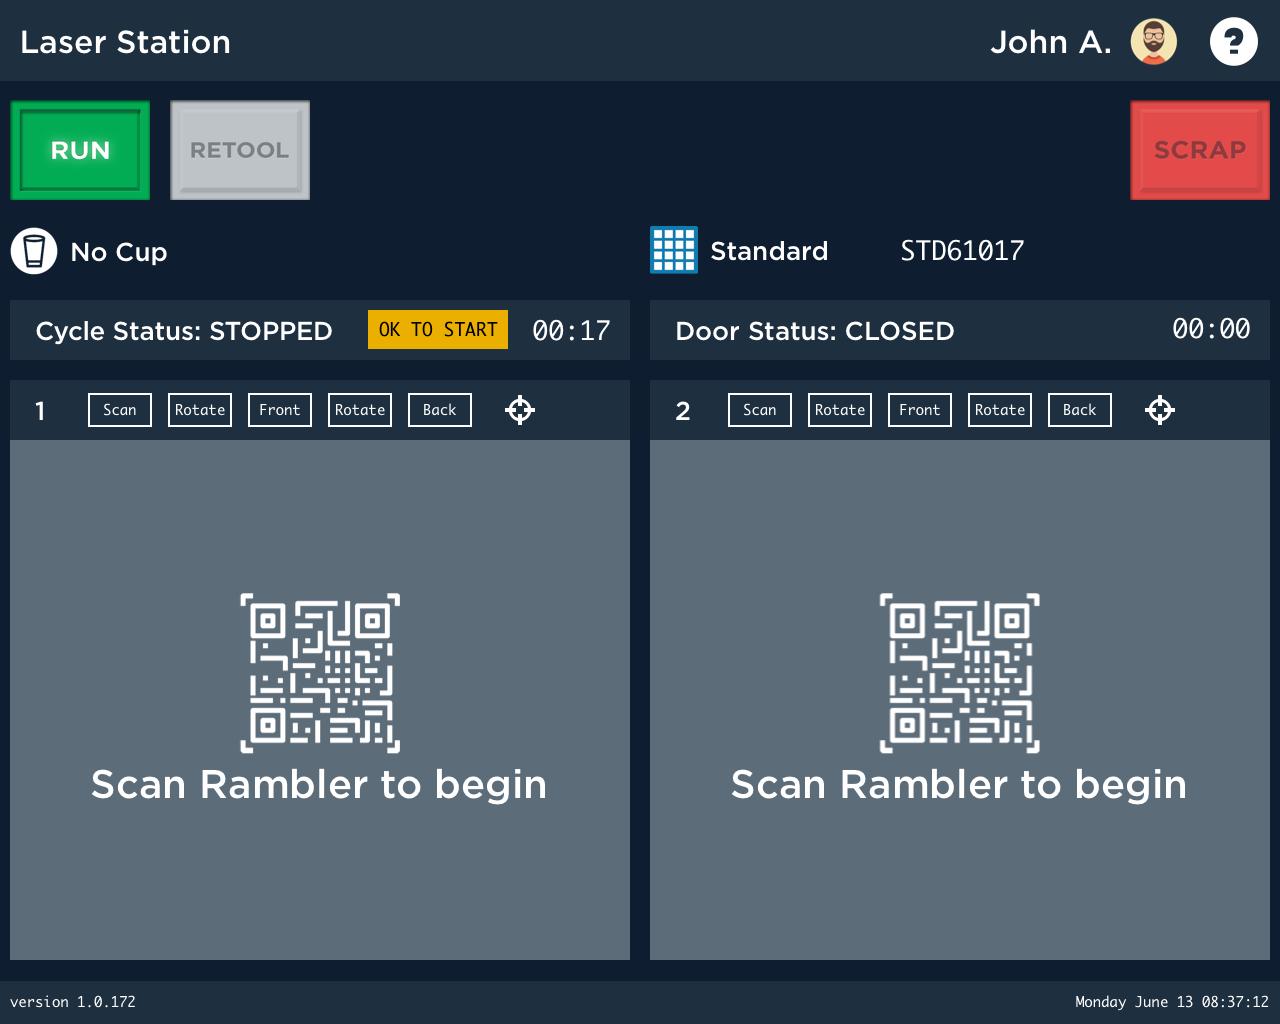 laser-station-scan-rambler-to-begin.jpg